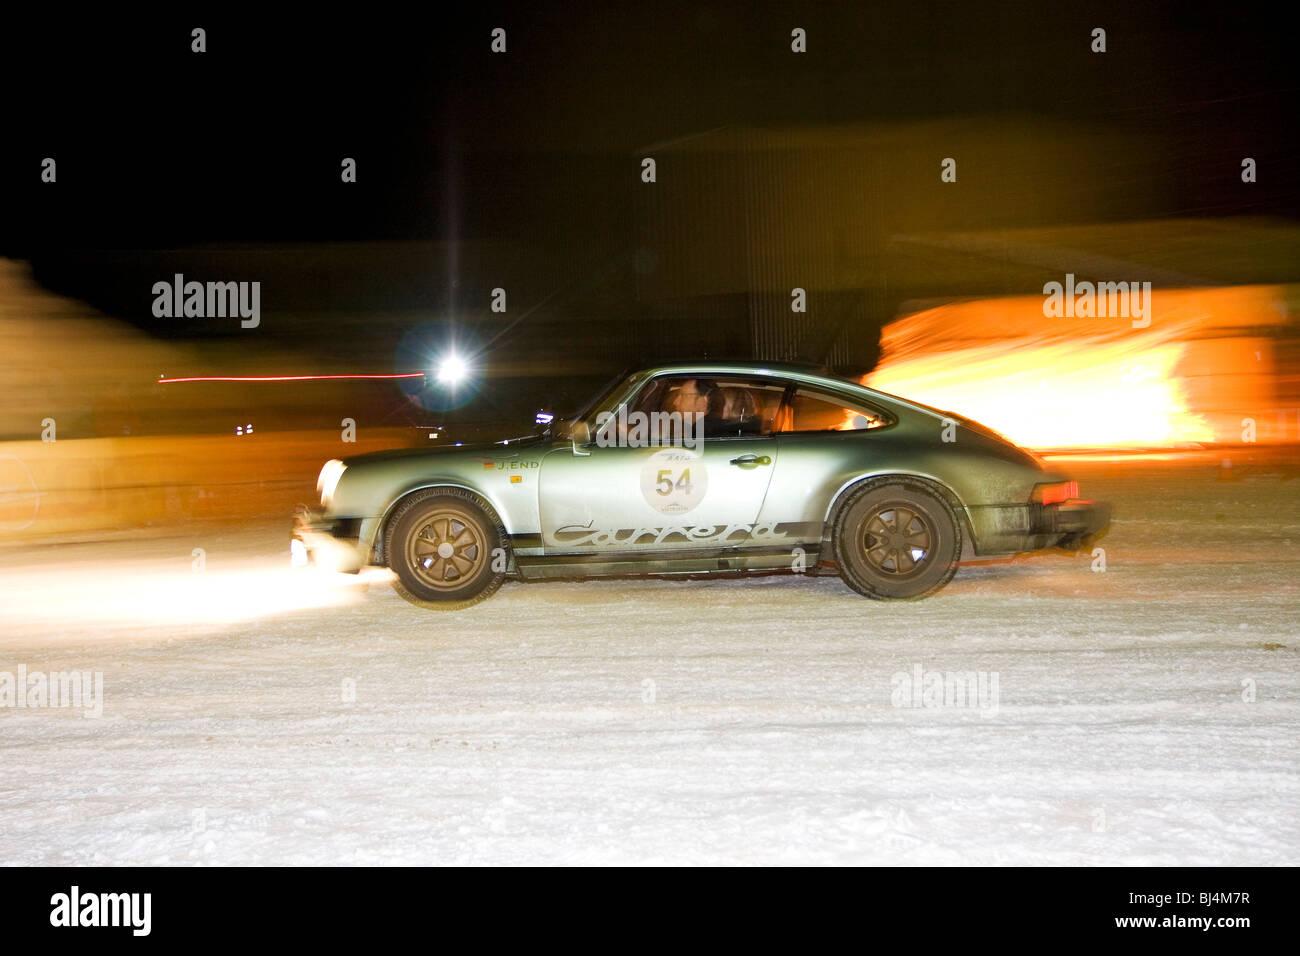 Classic Porsche Race Cars Stock Photos Classic Porsche Race Cars